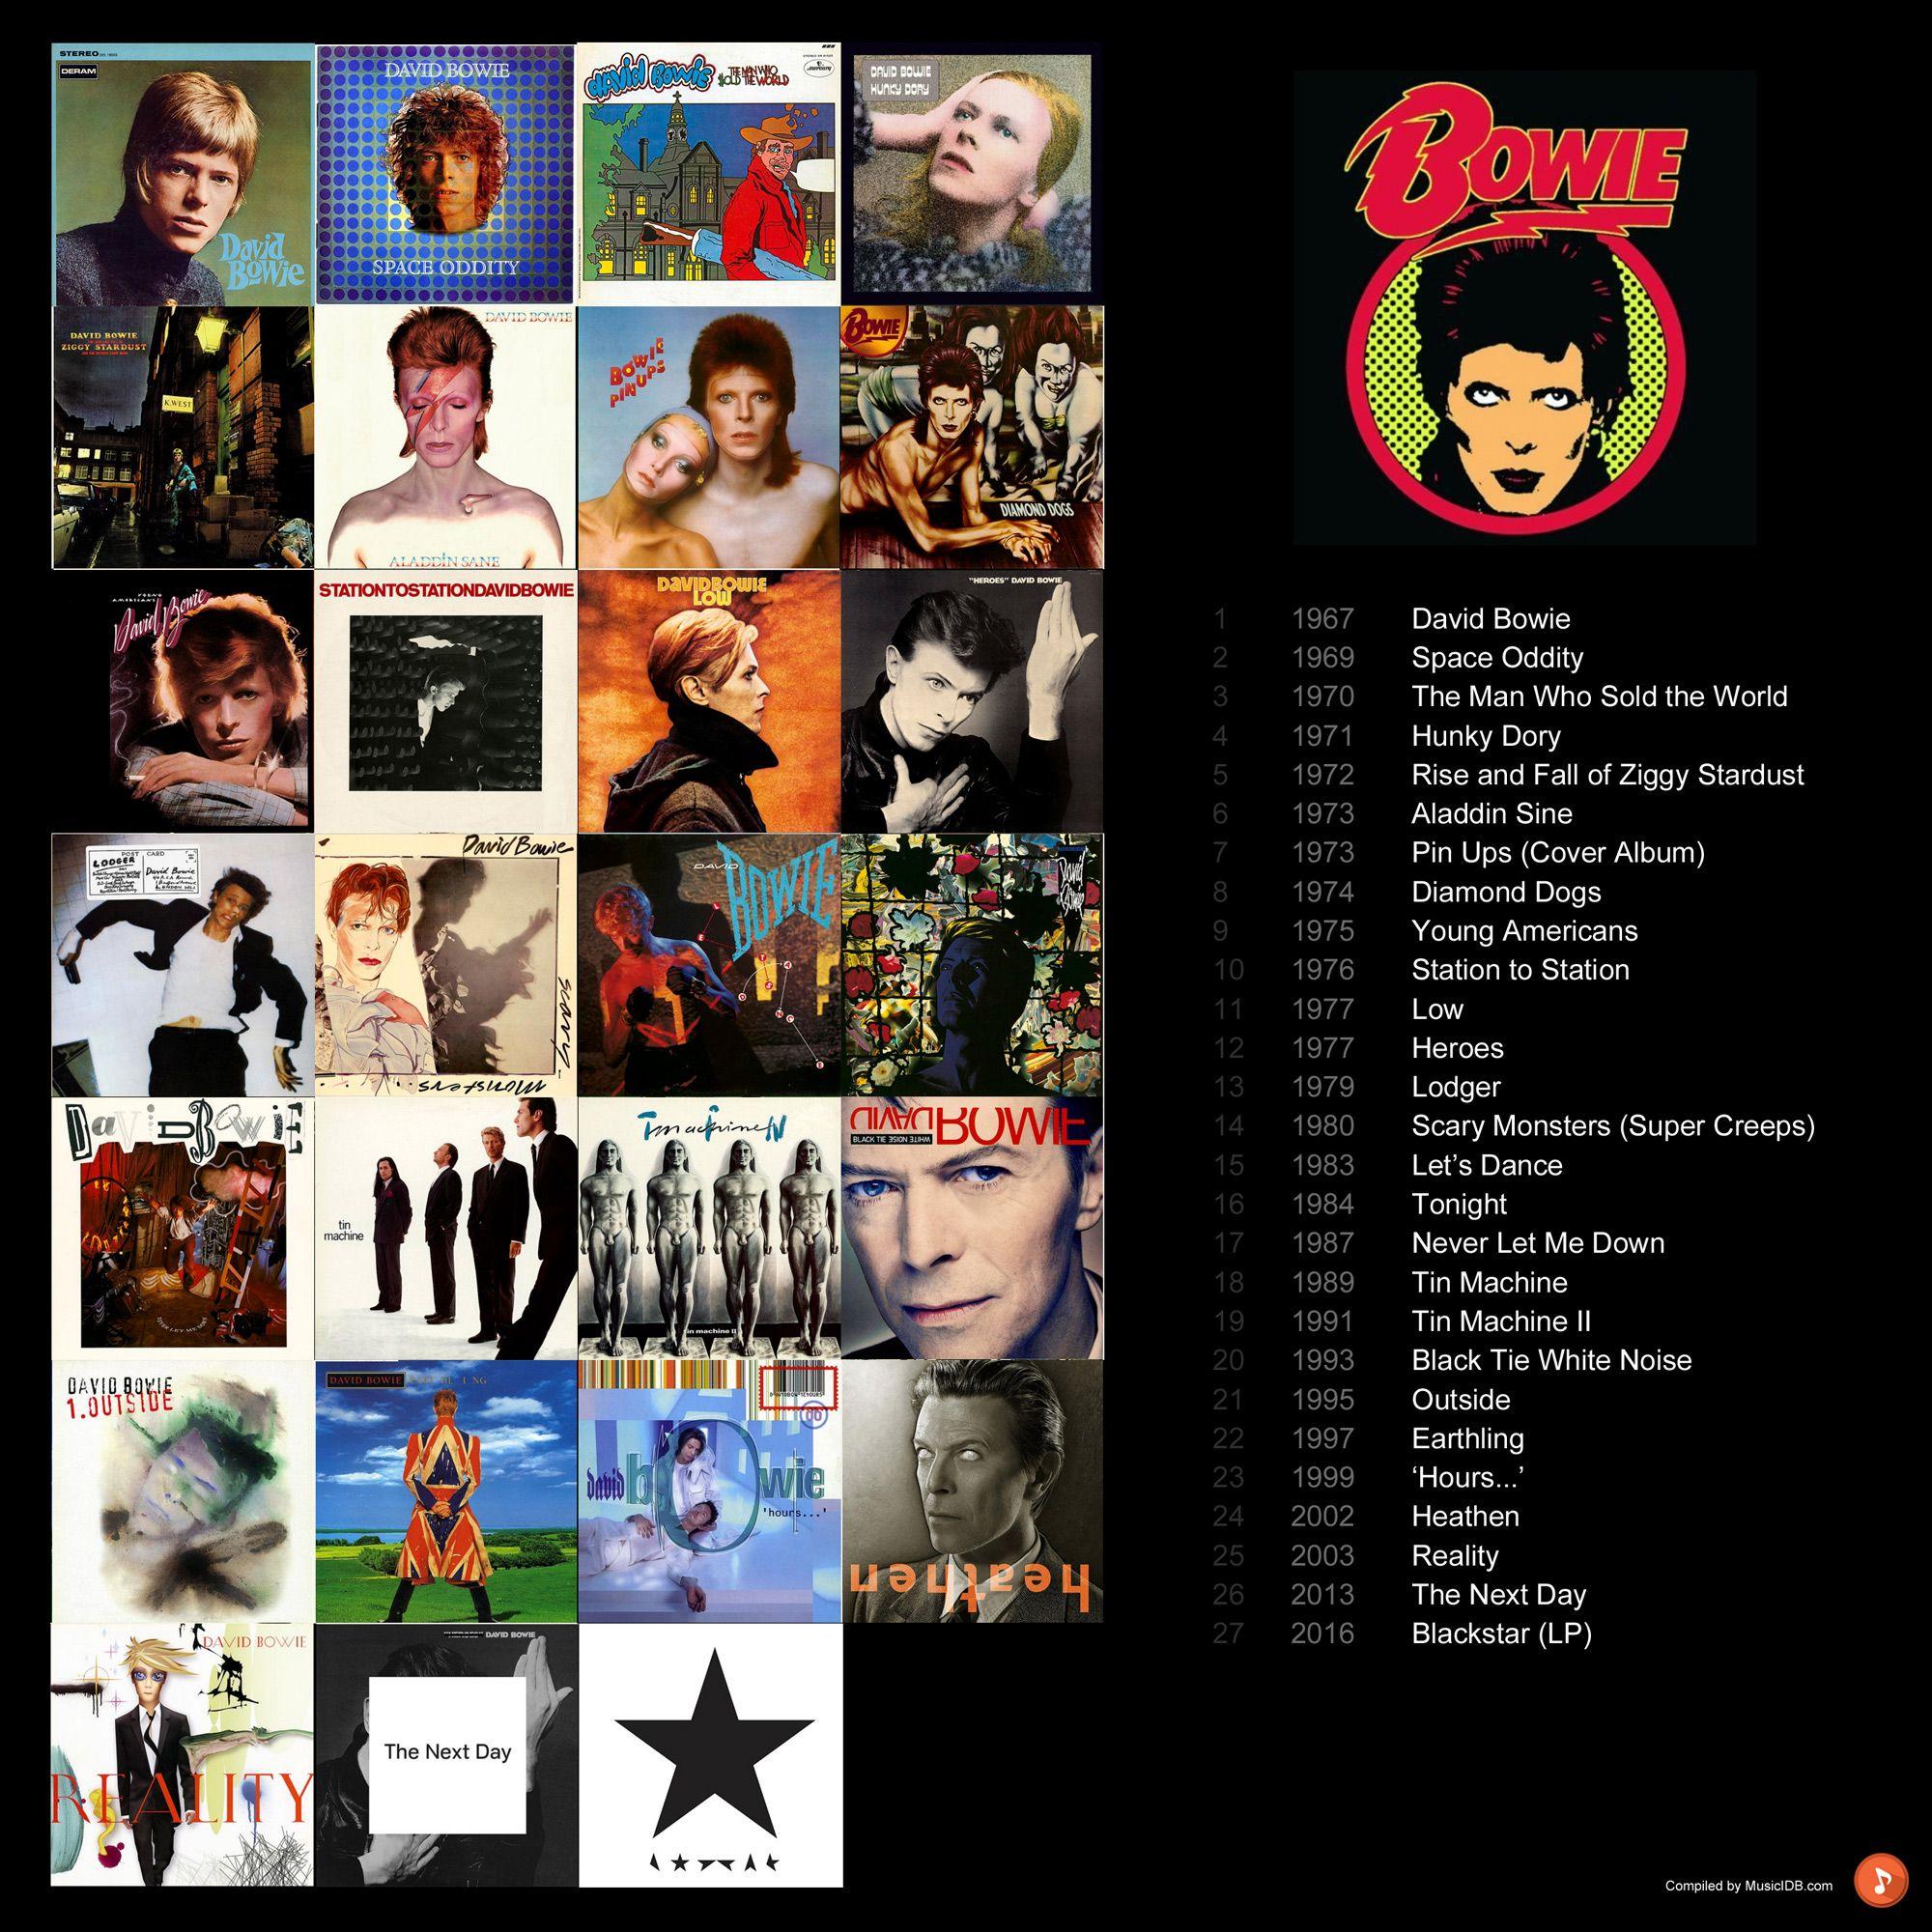 David Bowie\'s Discography (+ Album Covers)   Bowie   Pinterest   Bowie